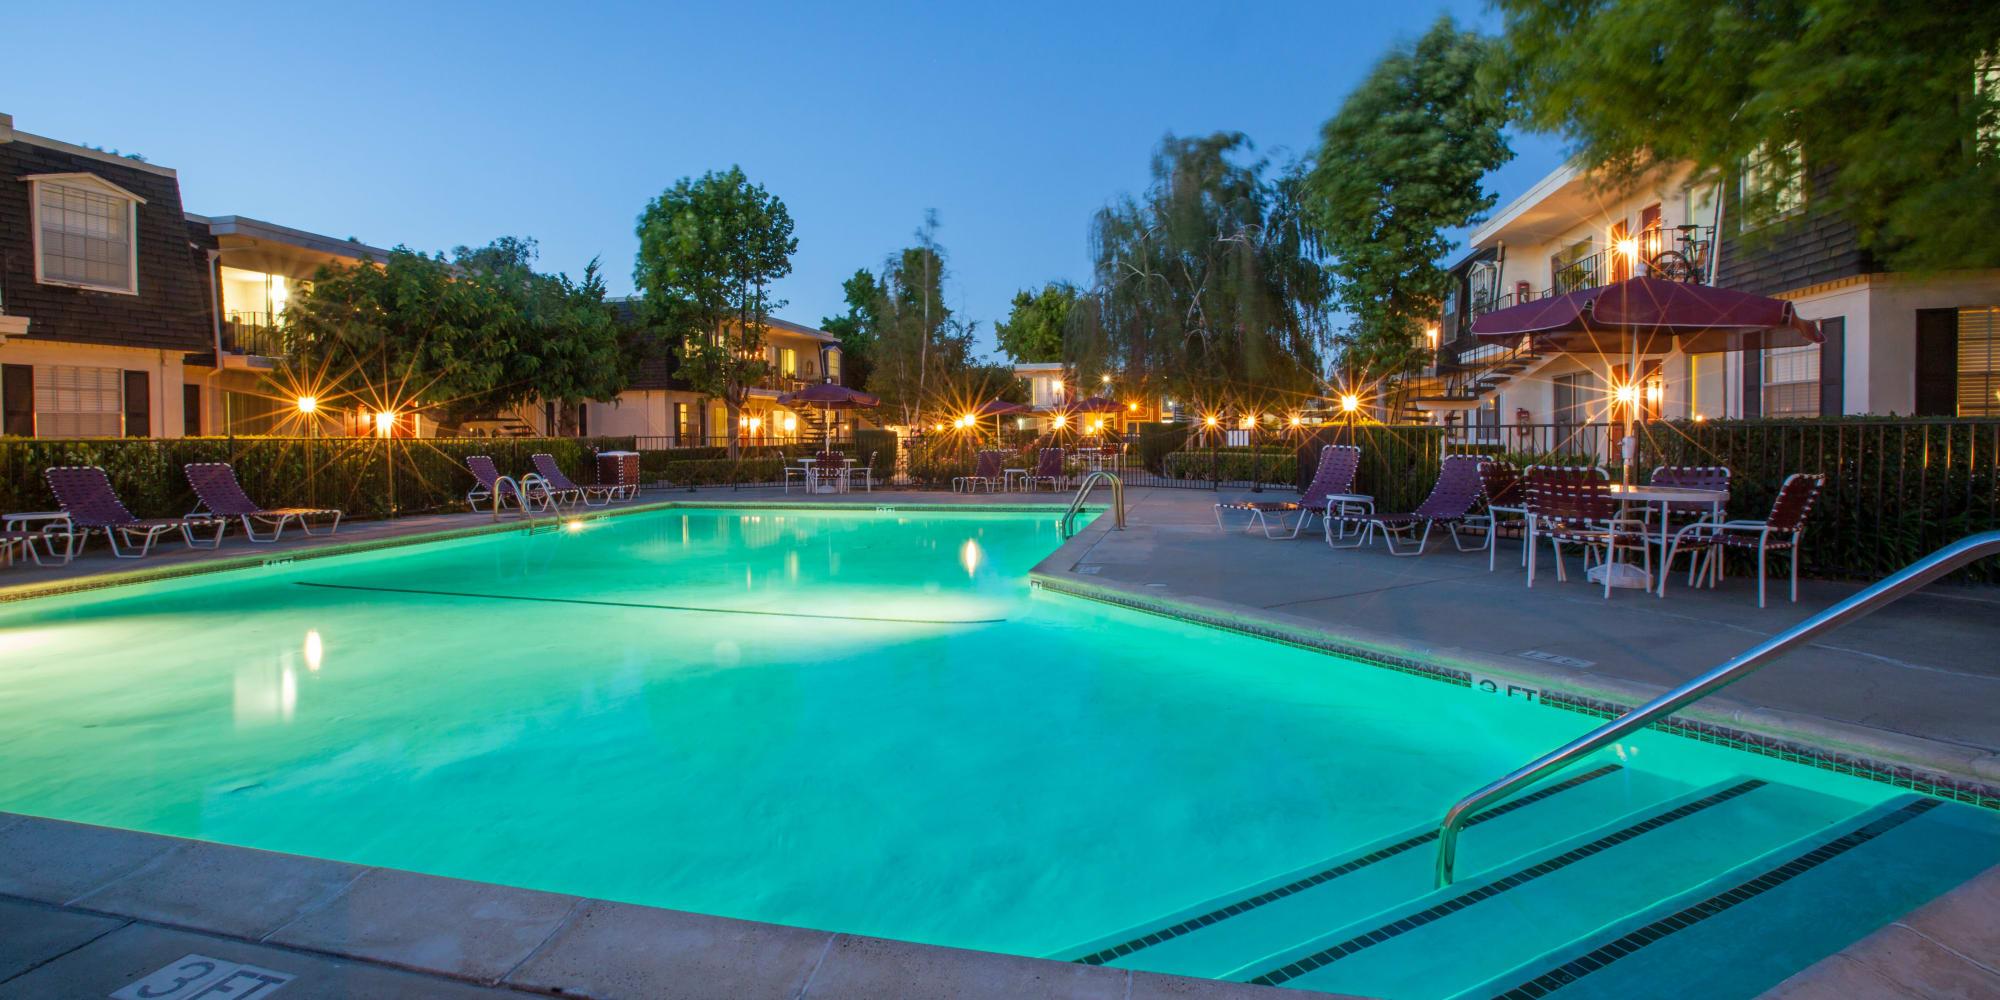 Normandy Park Apartments in Santa Clara, California